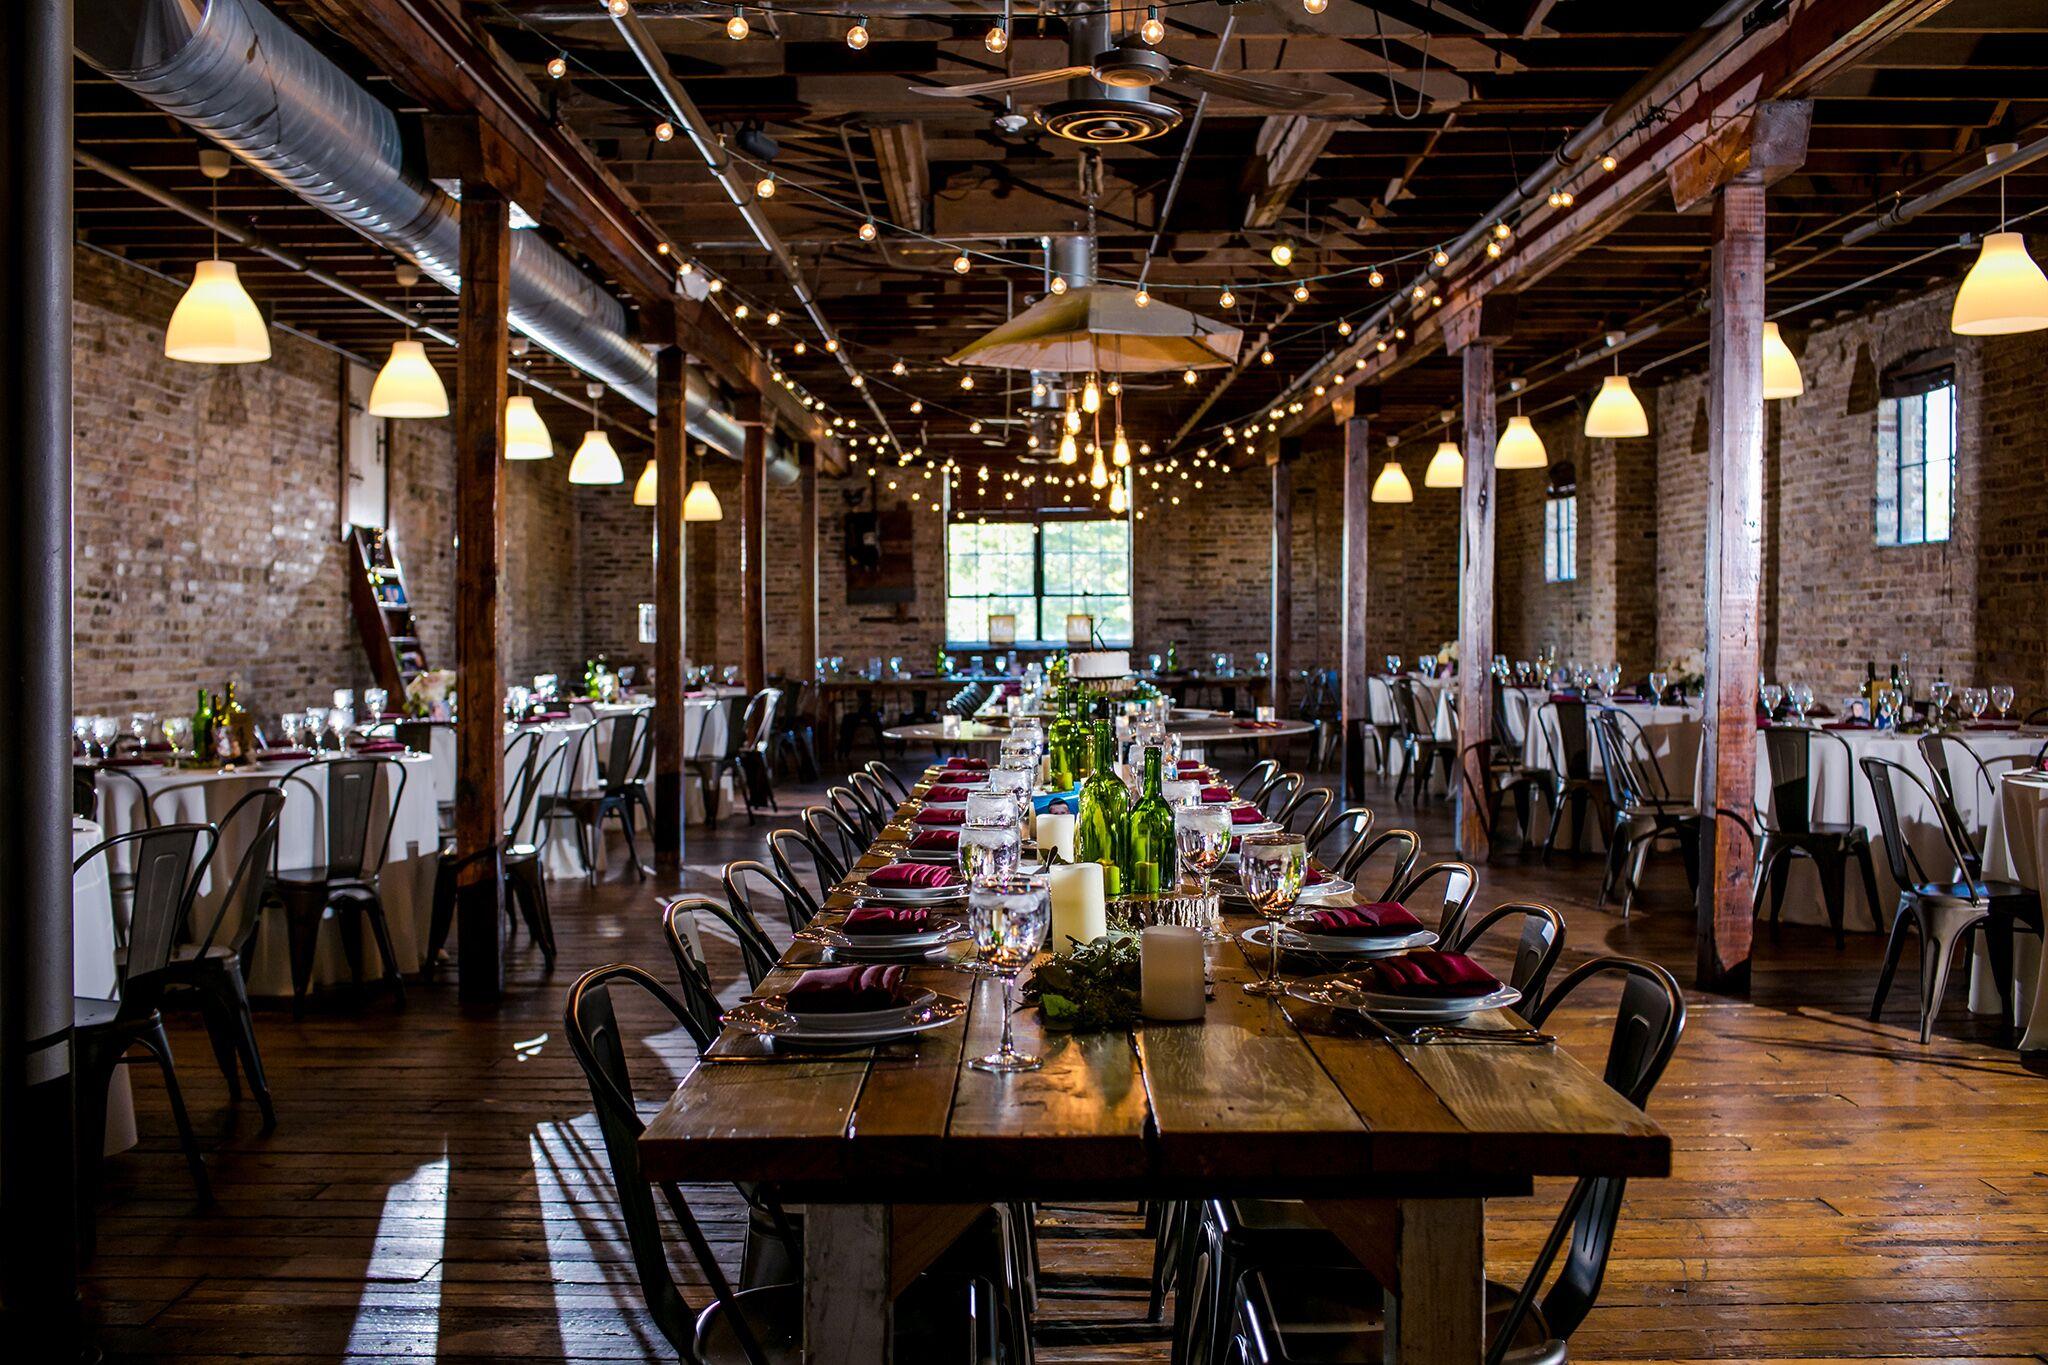 Wedding Reception Venues In Schaumburg IL